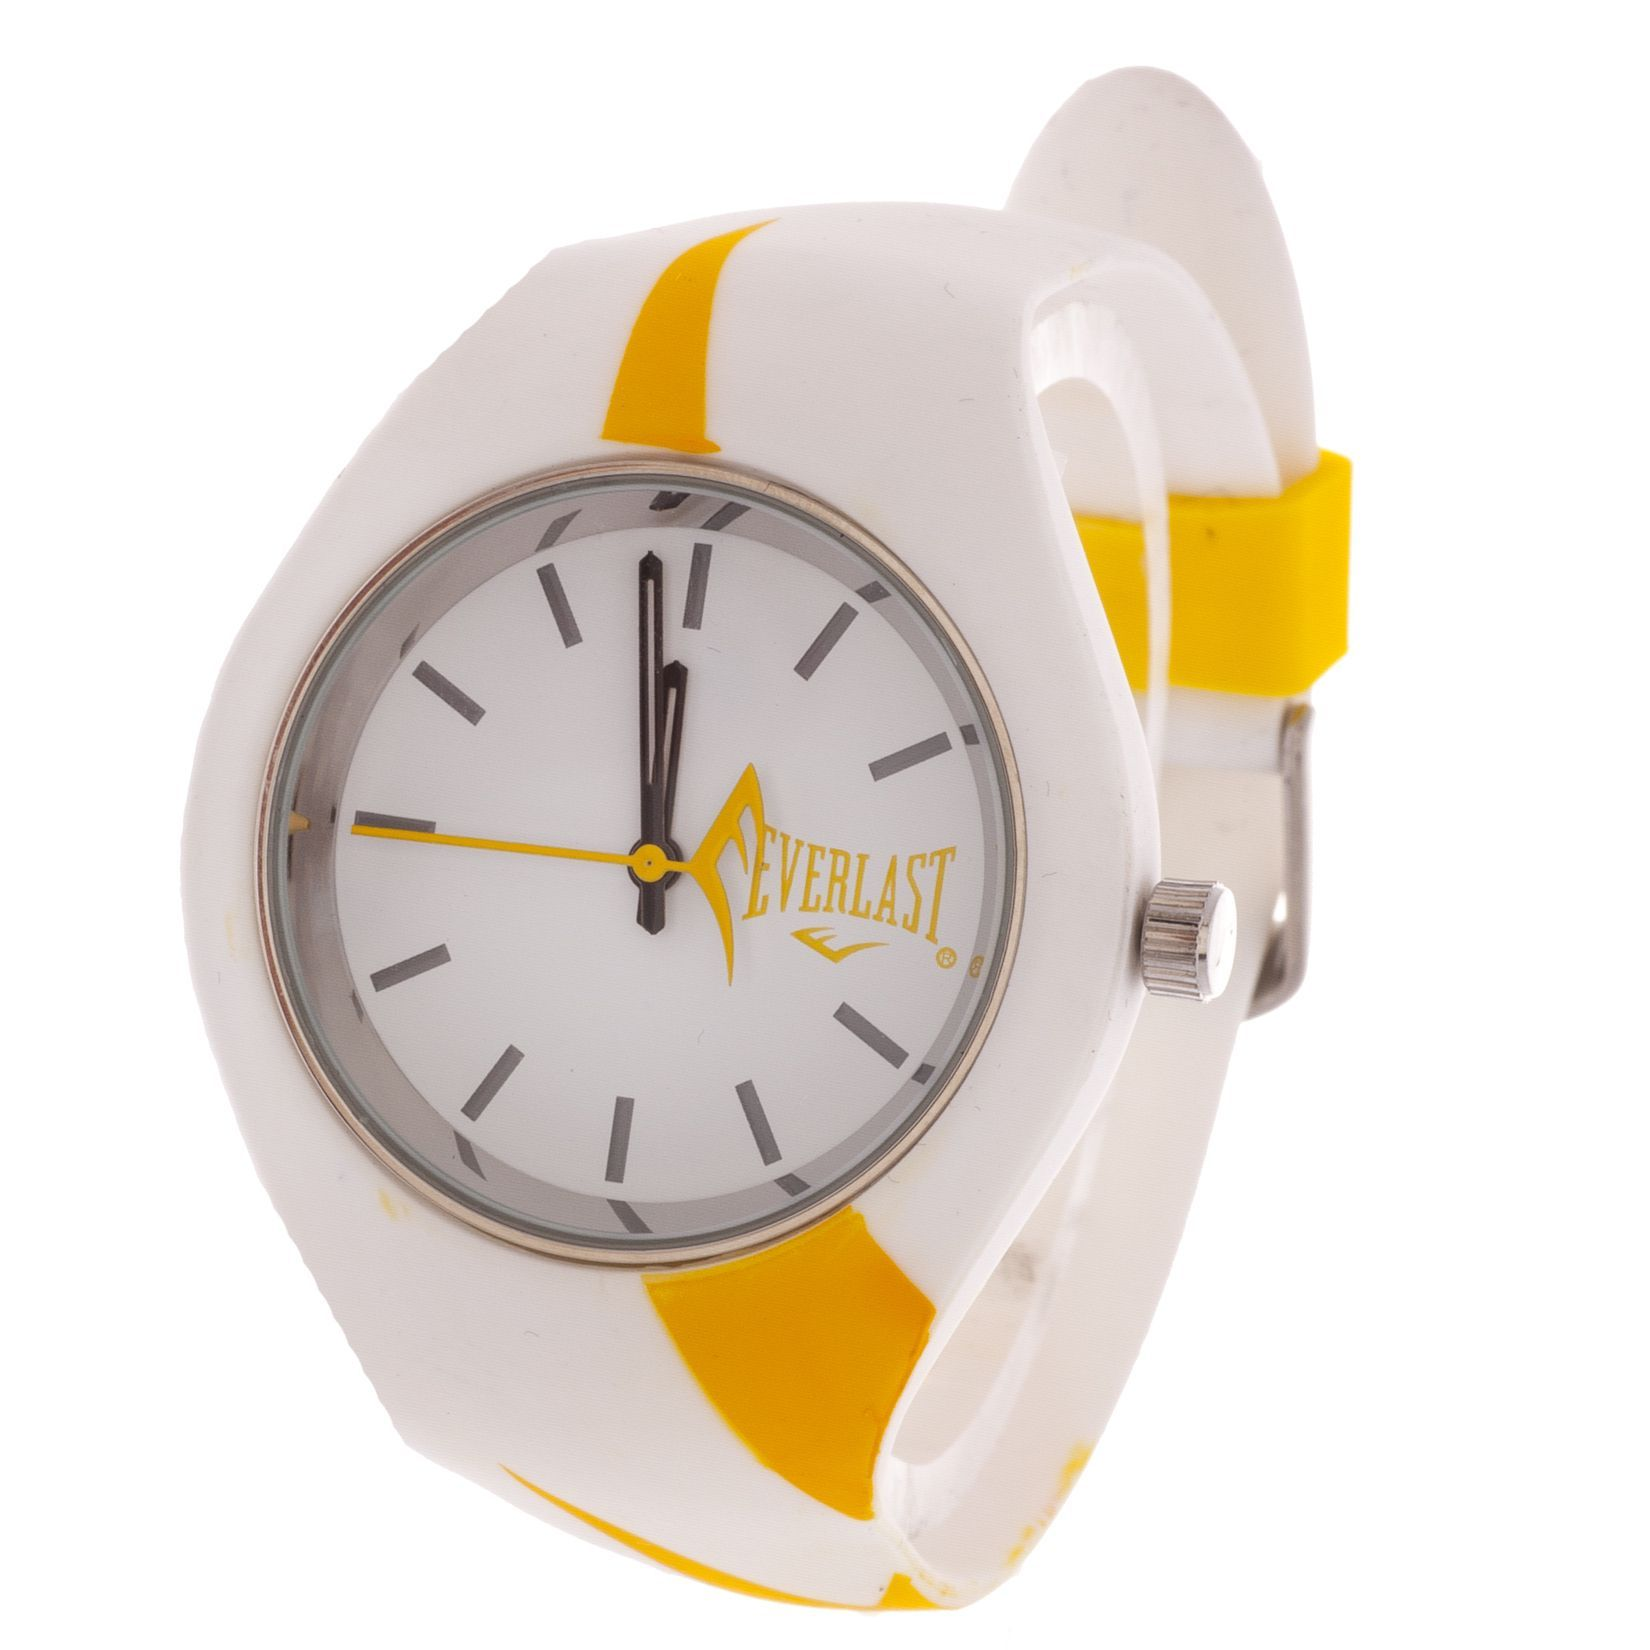 Everlast Slim Yellow Round Sport Analog Watch With Strap